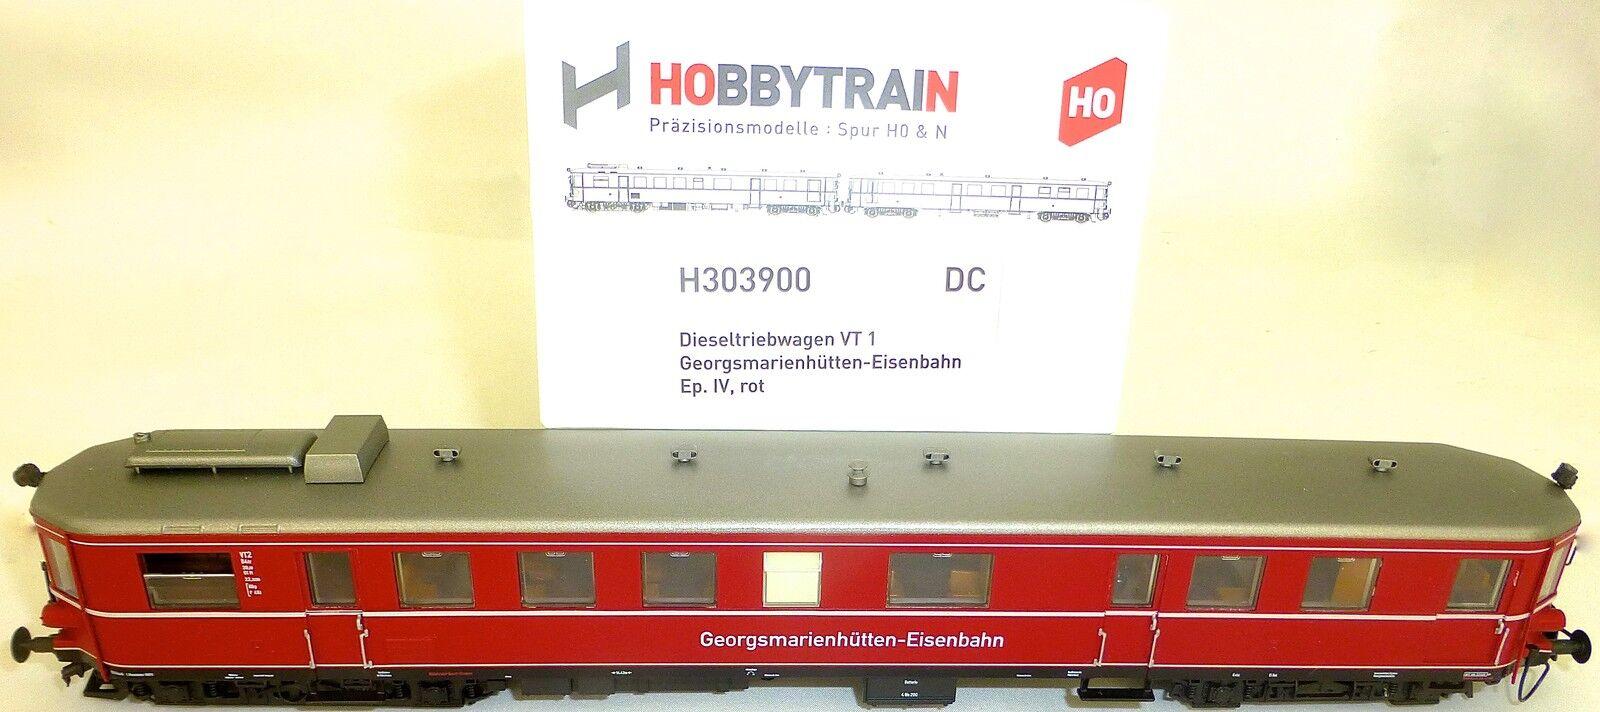 Vagone Motore Diesel VT 2 Georgsmarienhütten Ferrovia Ep.iv Hobbytrain H303900